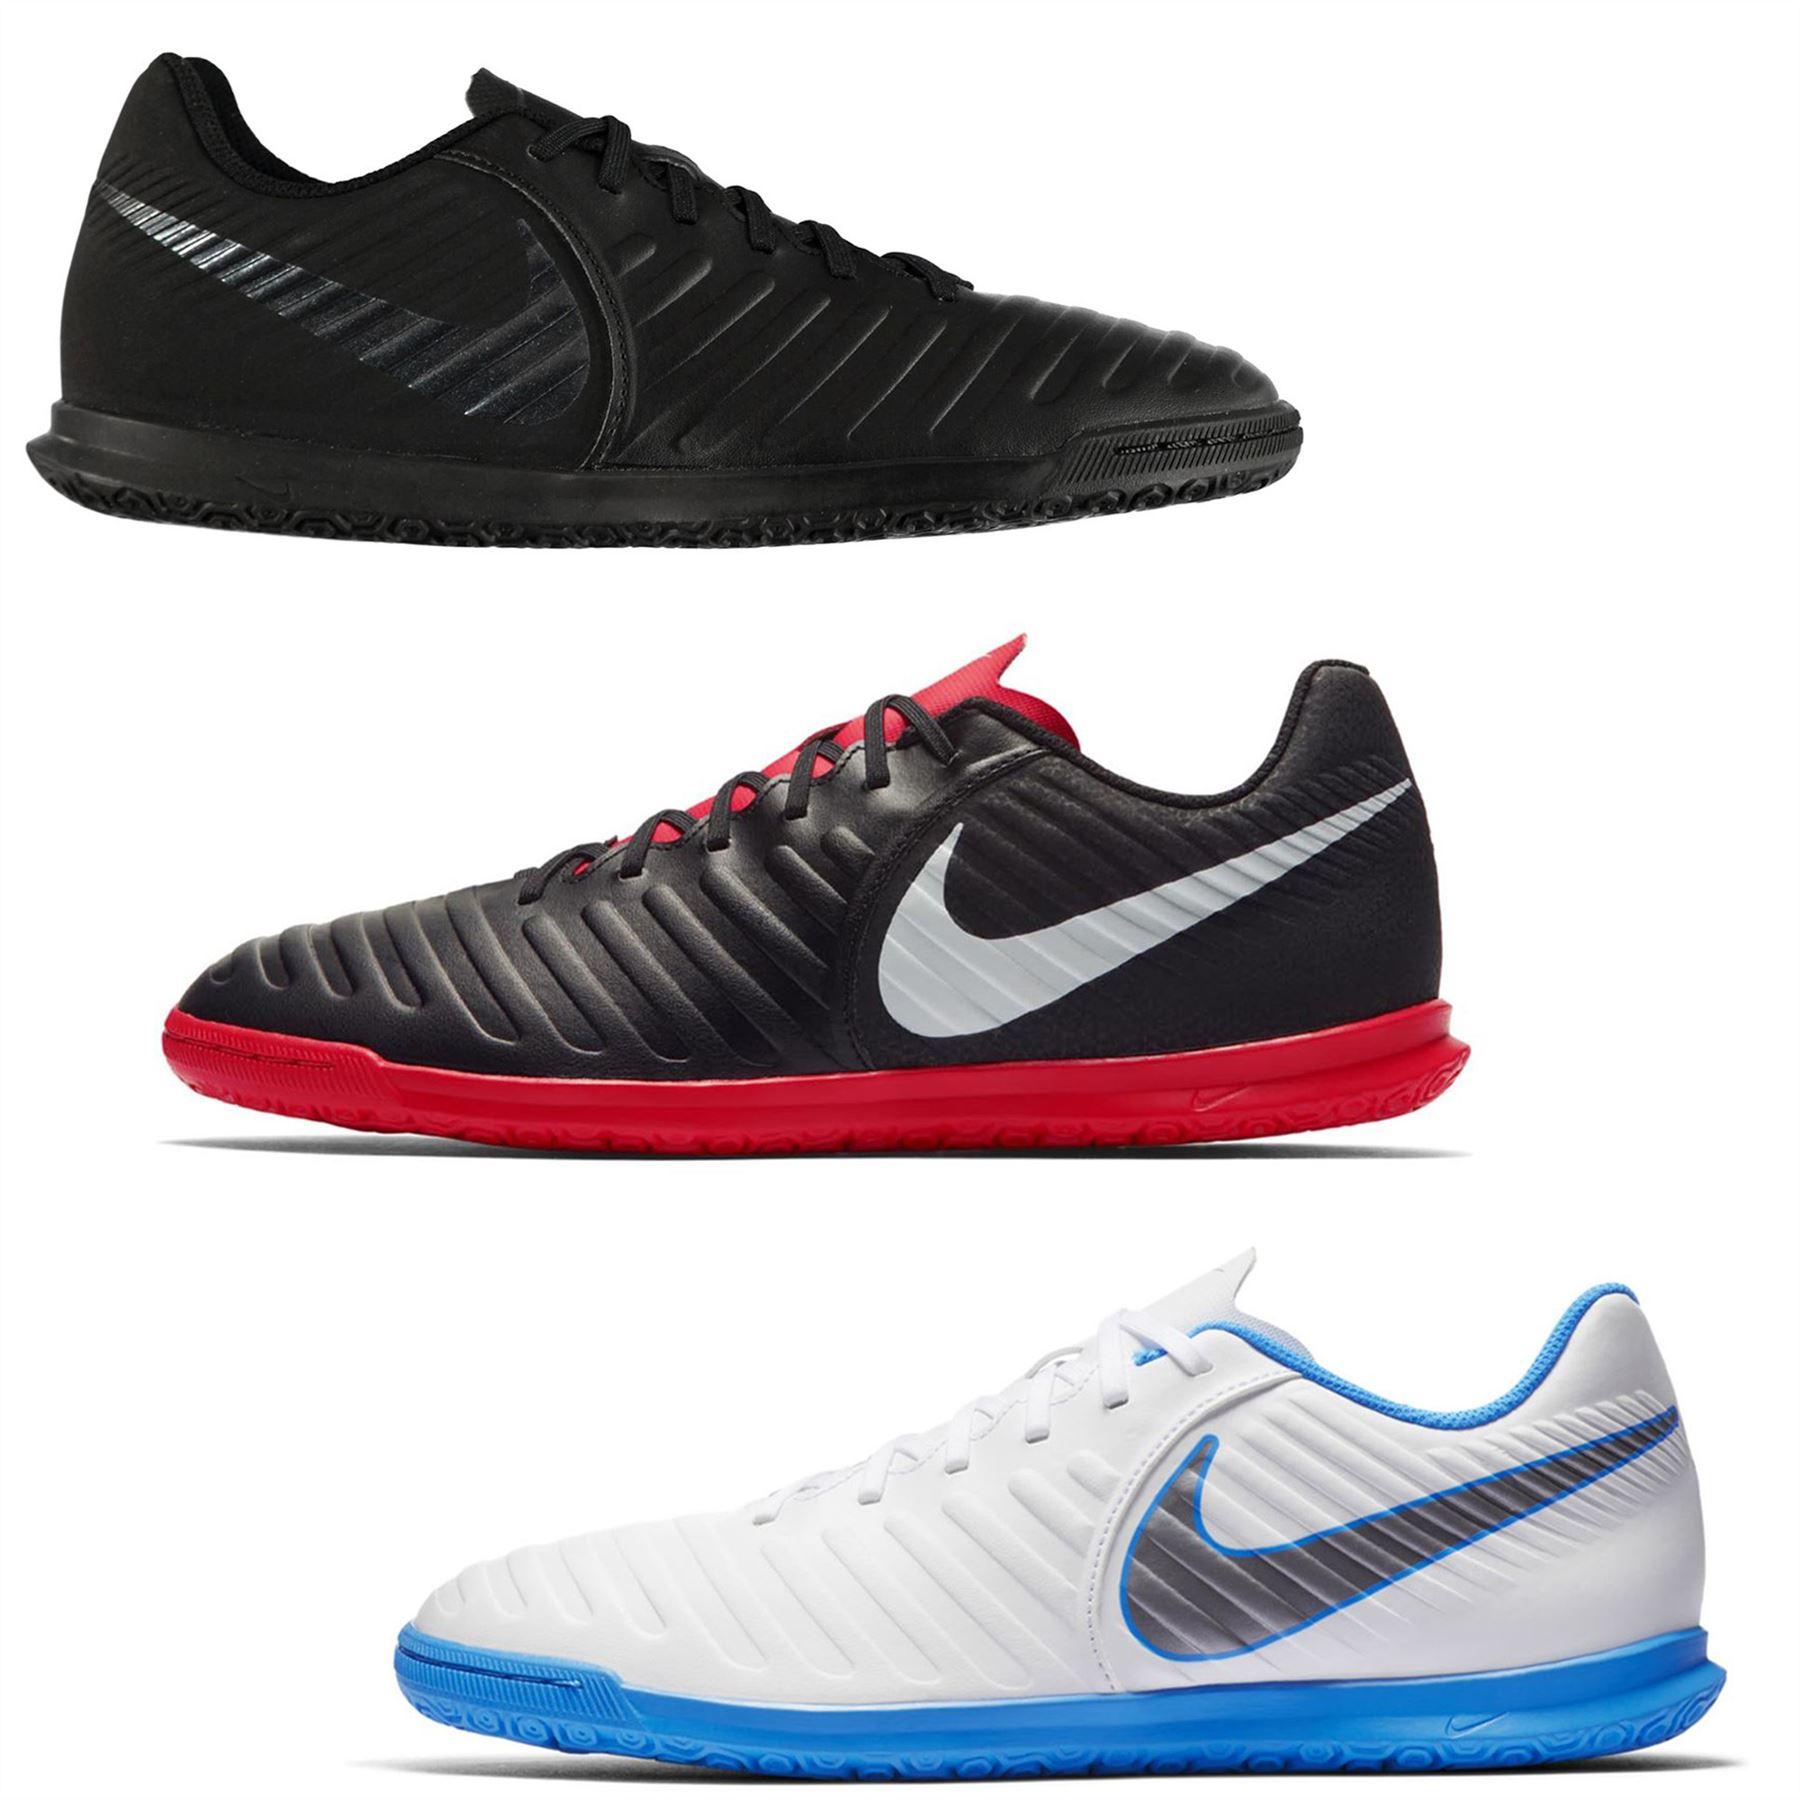 bc2c7336c4f46 ... Nike Tiempo Legend Club Indoor Football Trainers Mens Soccer Futsal  Shoes ...